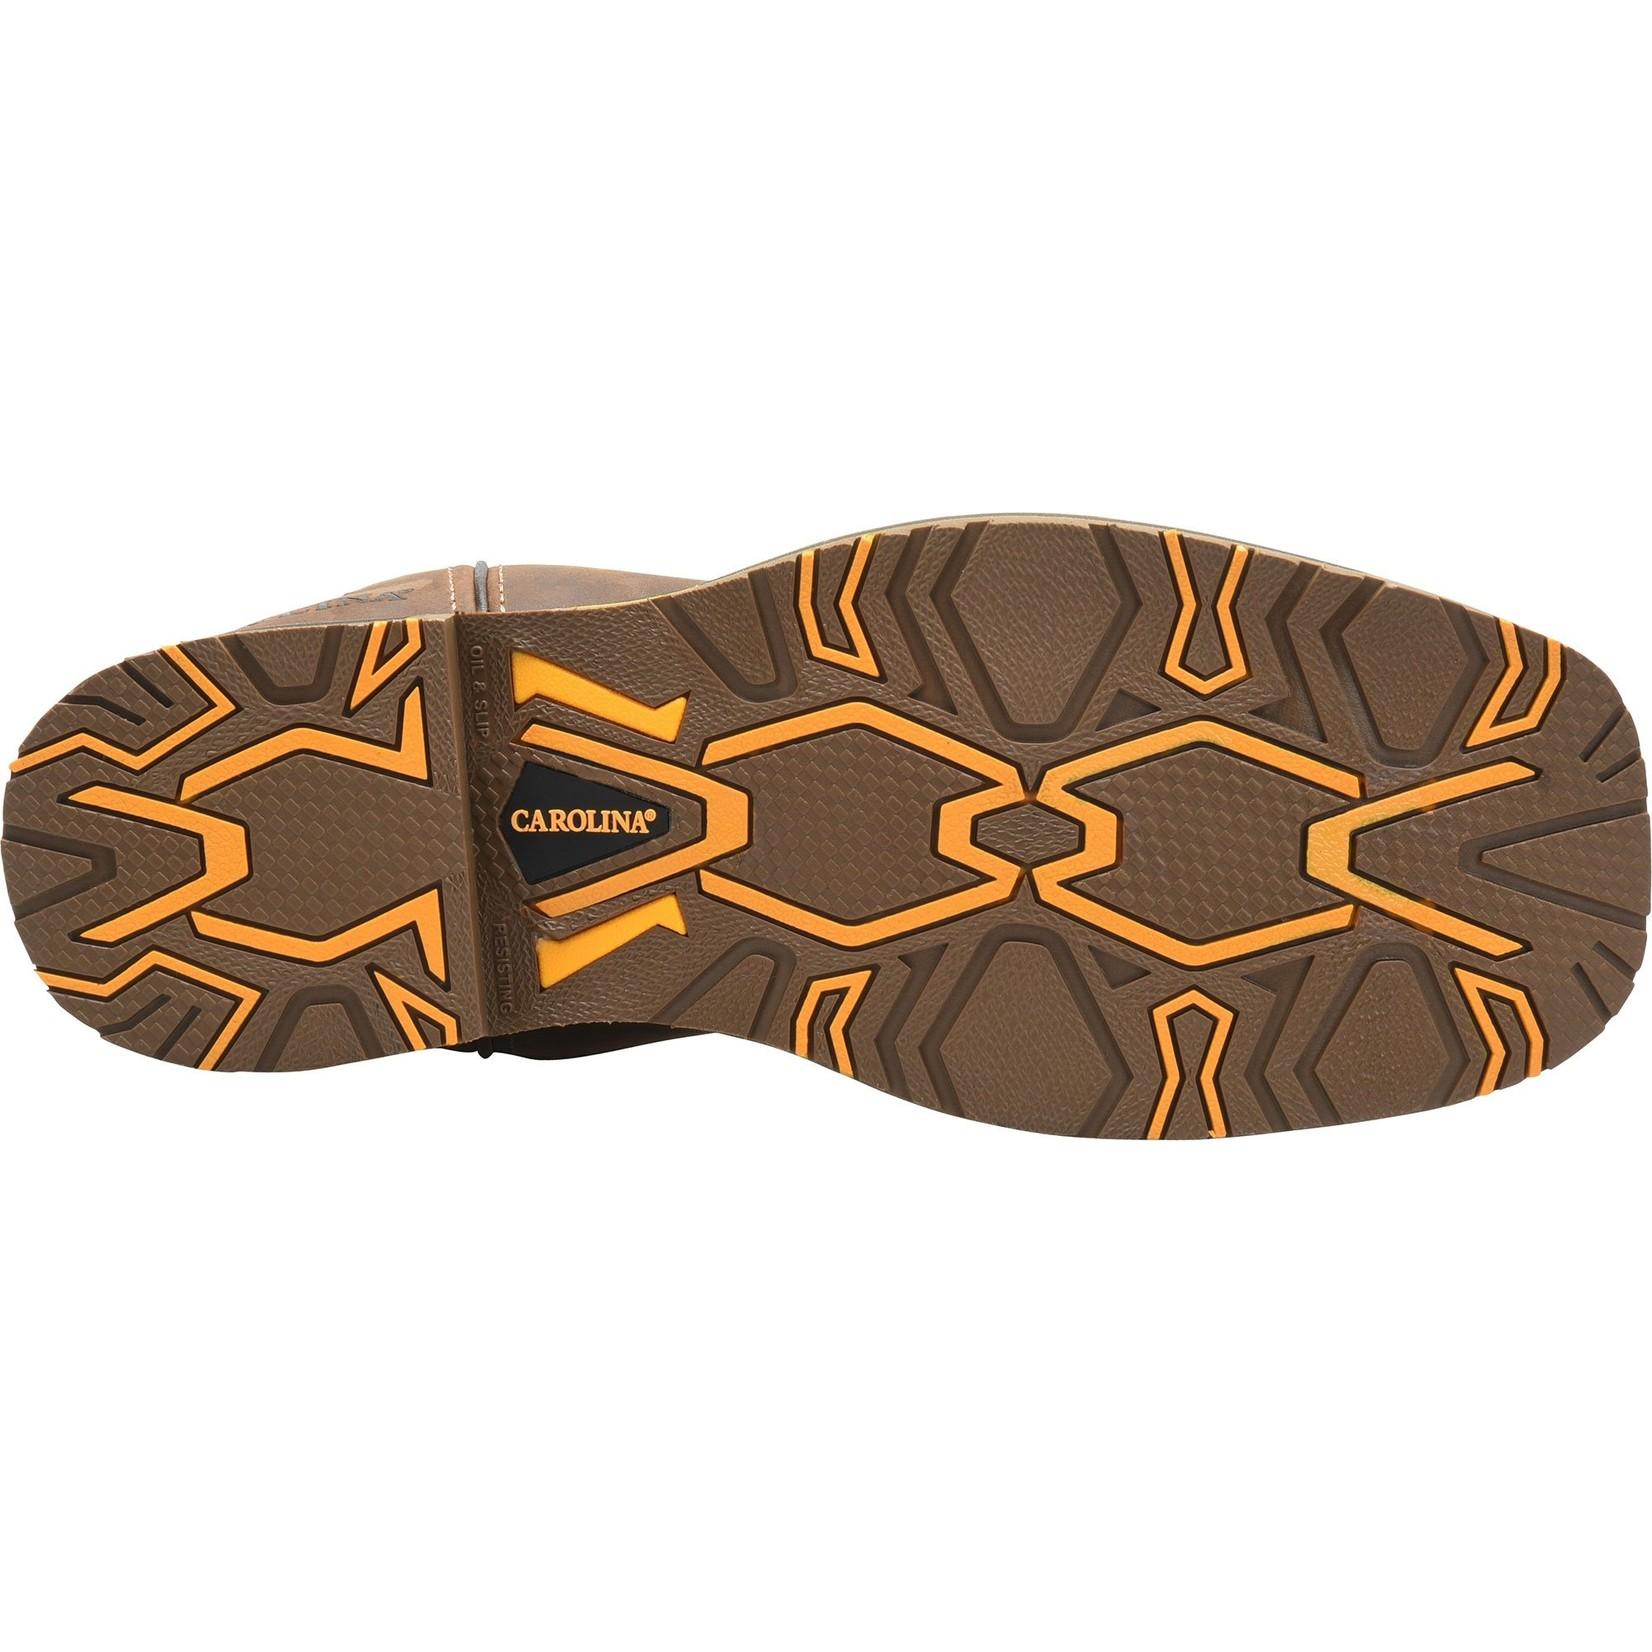 "Carolina Men's Carolina 10"" Composite Toe Waterproof  Anchor CA8536"